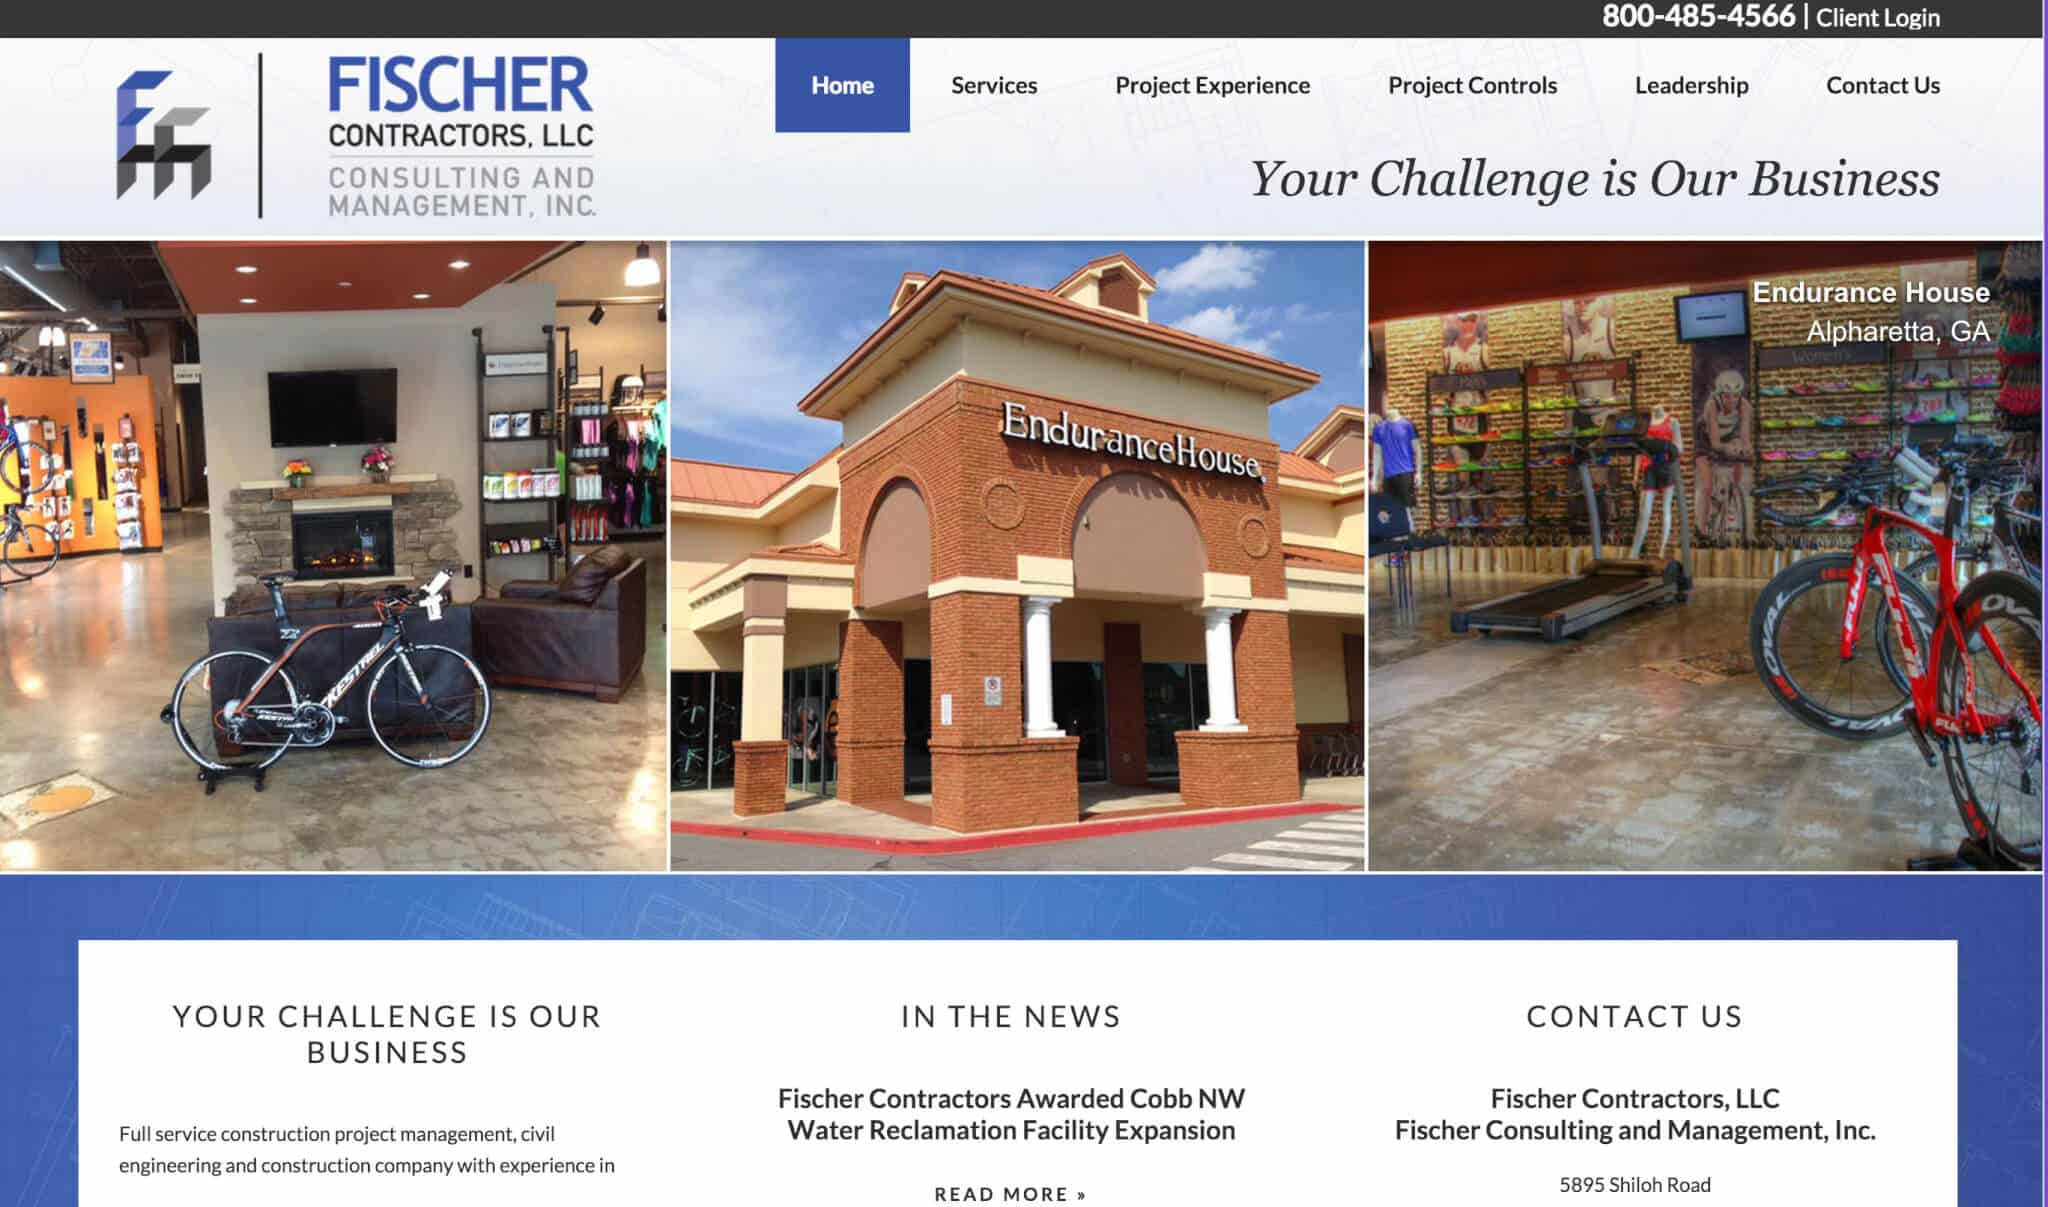 FischerCM.com Mobile Responsive Web Design